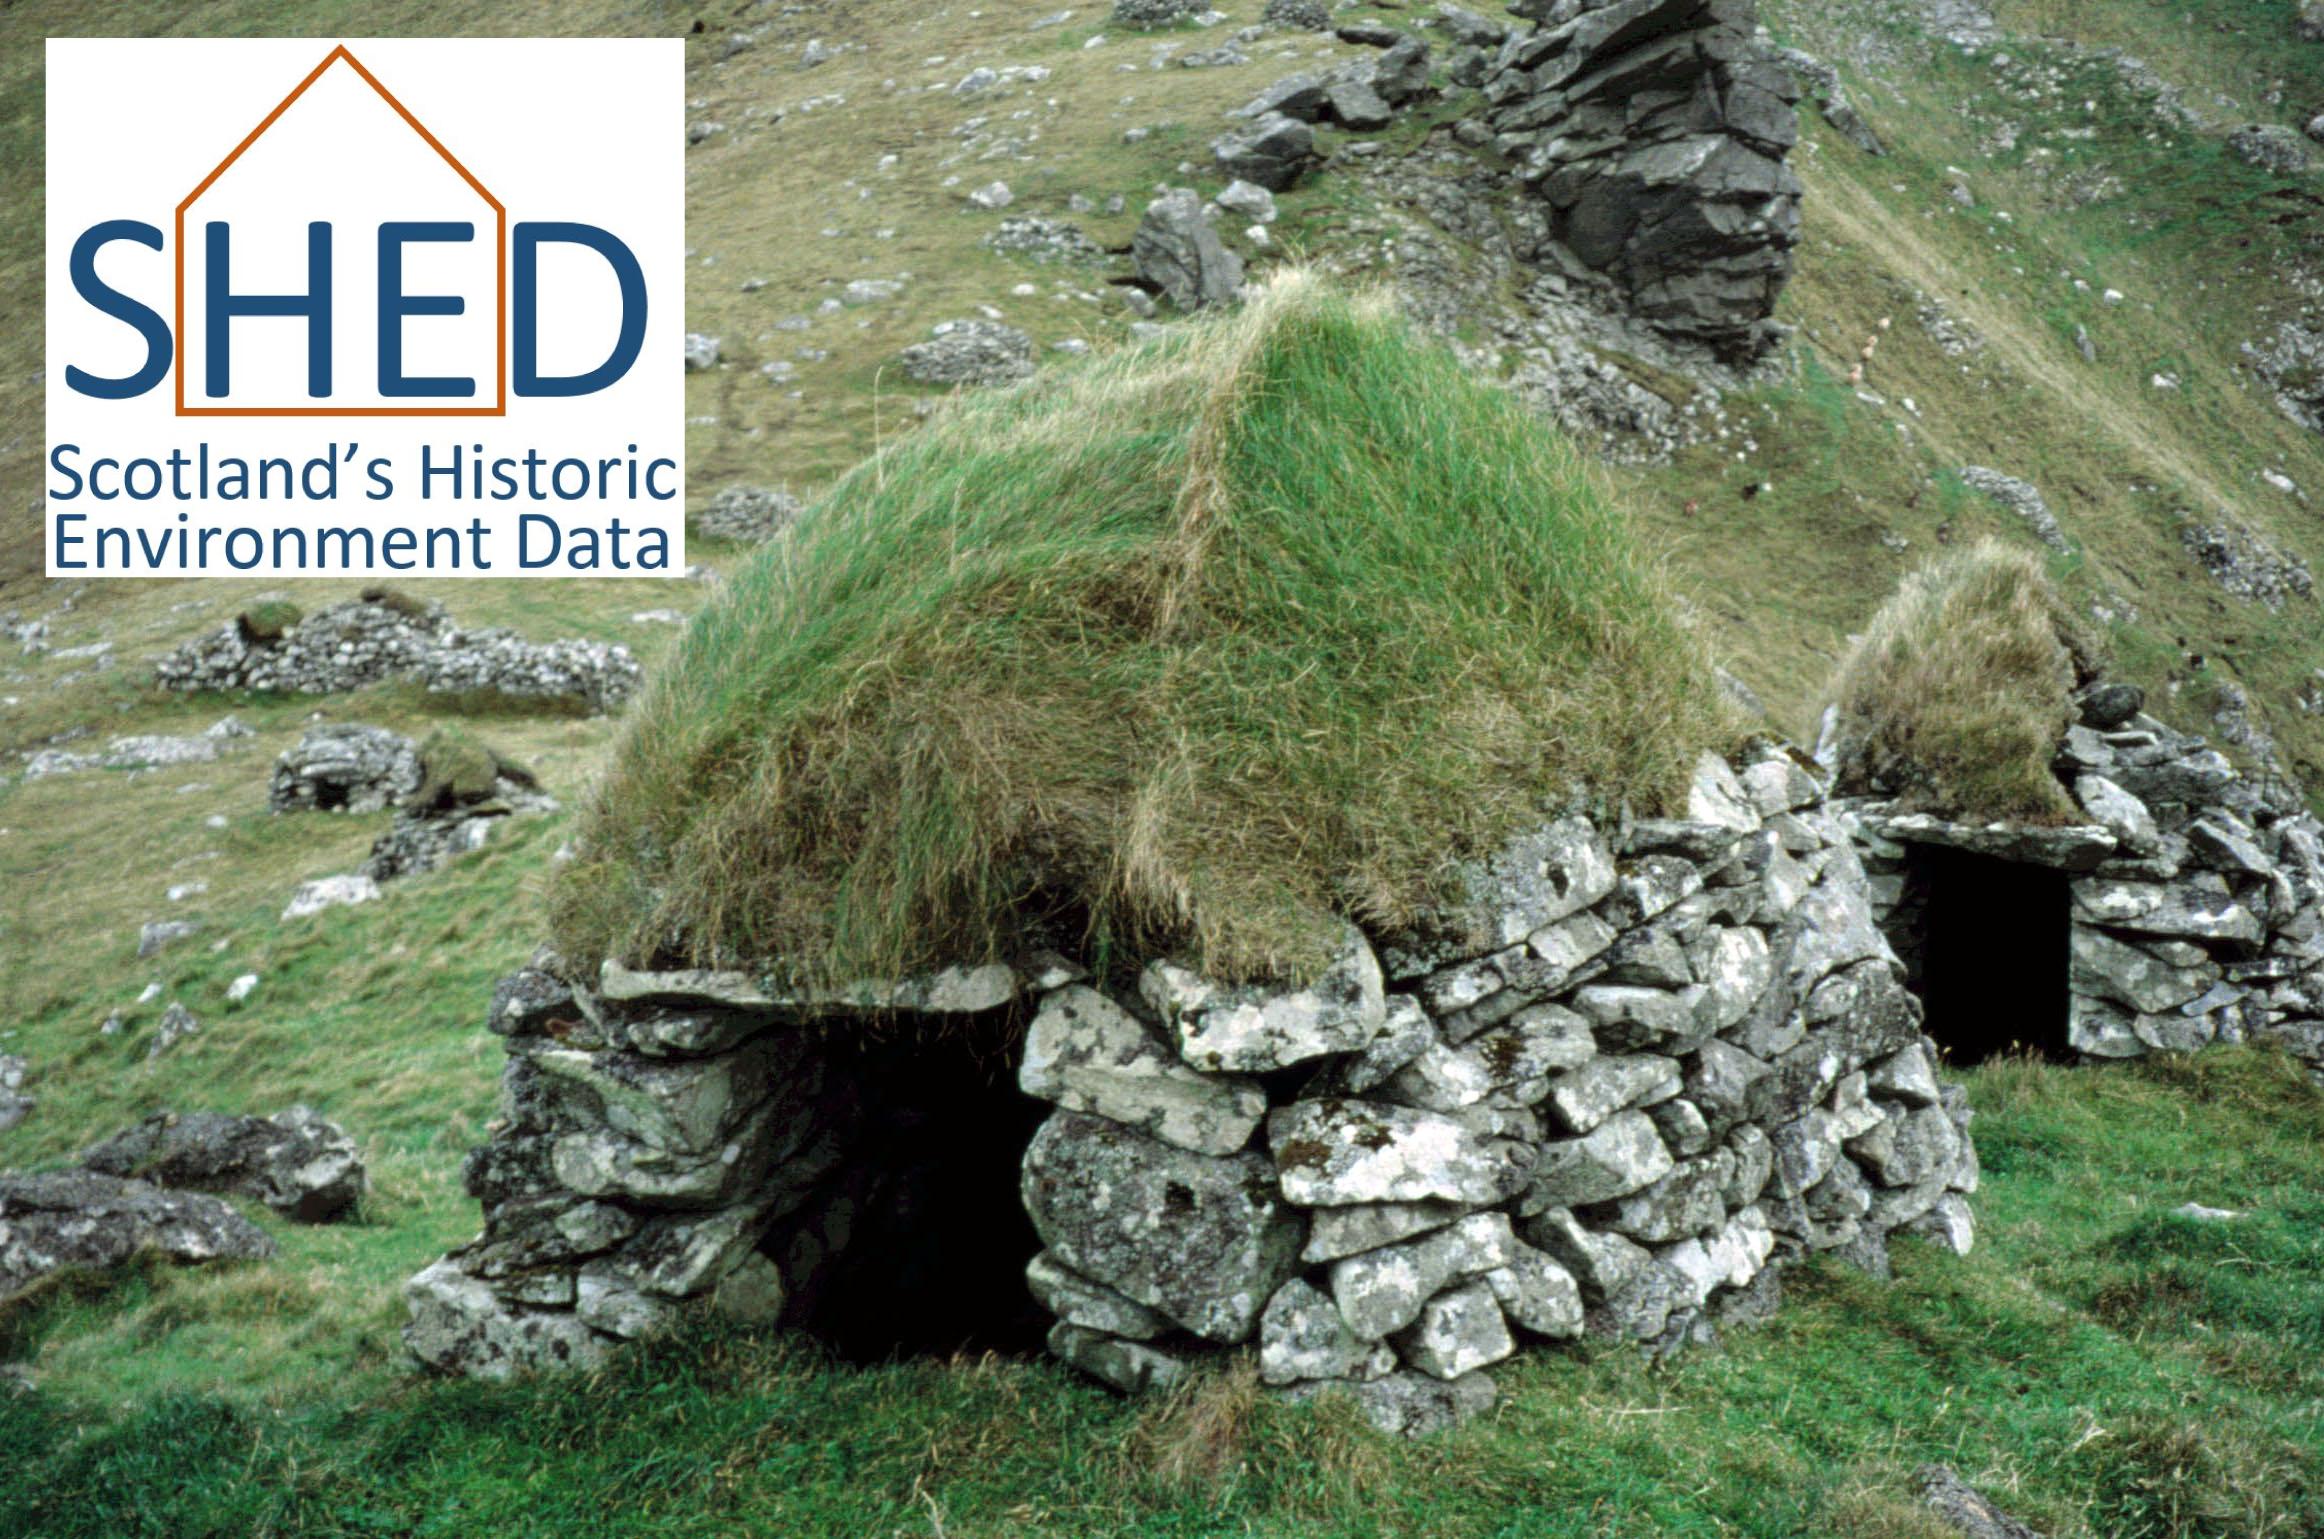 Cleits - St Kilda's sheds